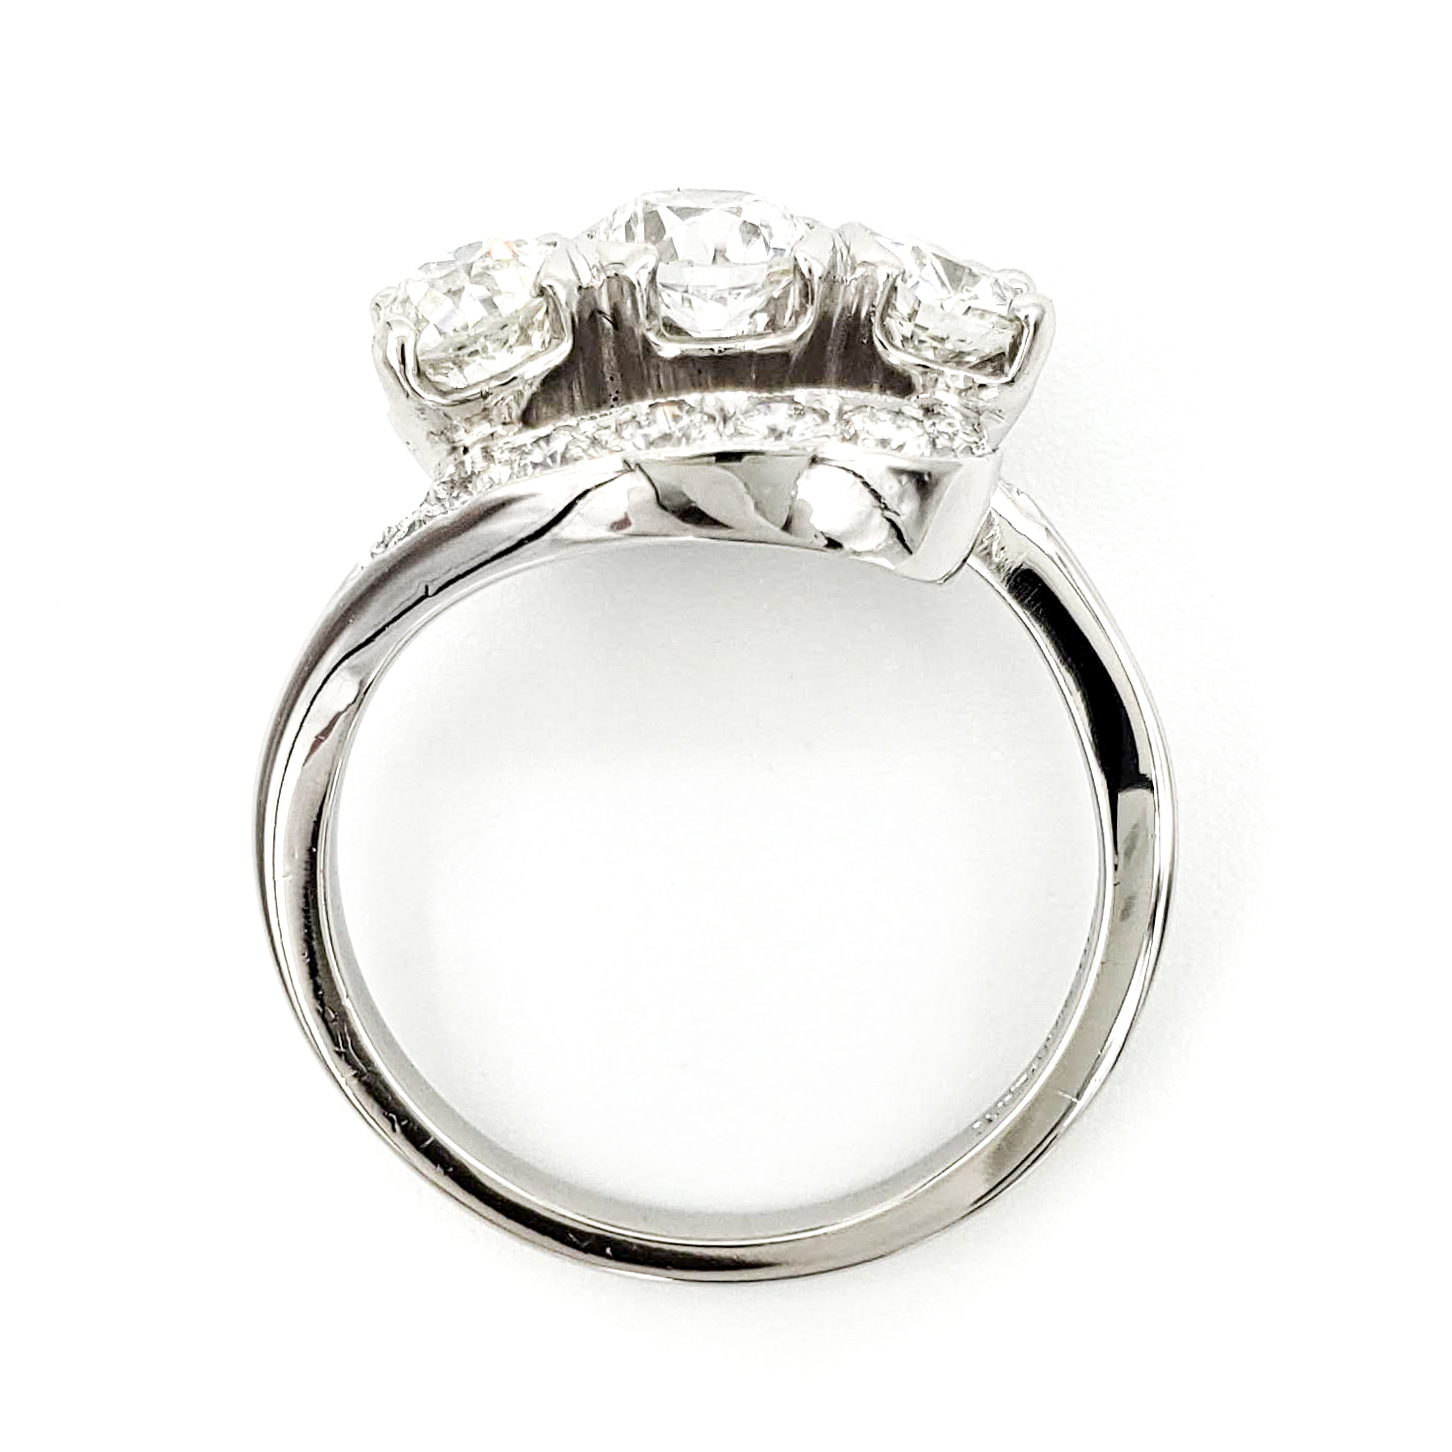 vintage-platinum-engagement-ring-with-0-42-carat-old-european-cut-diamond-egl-e-vs2